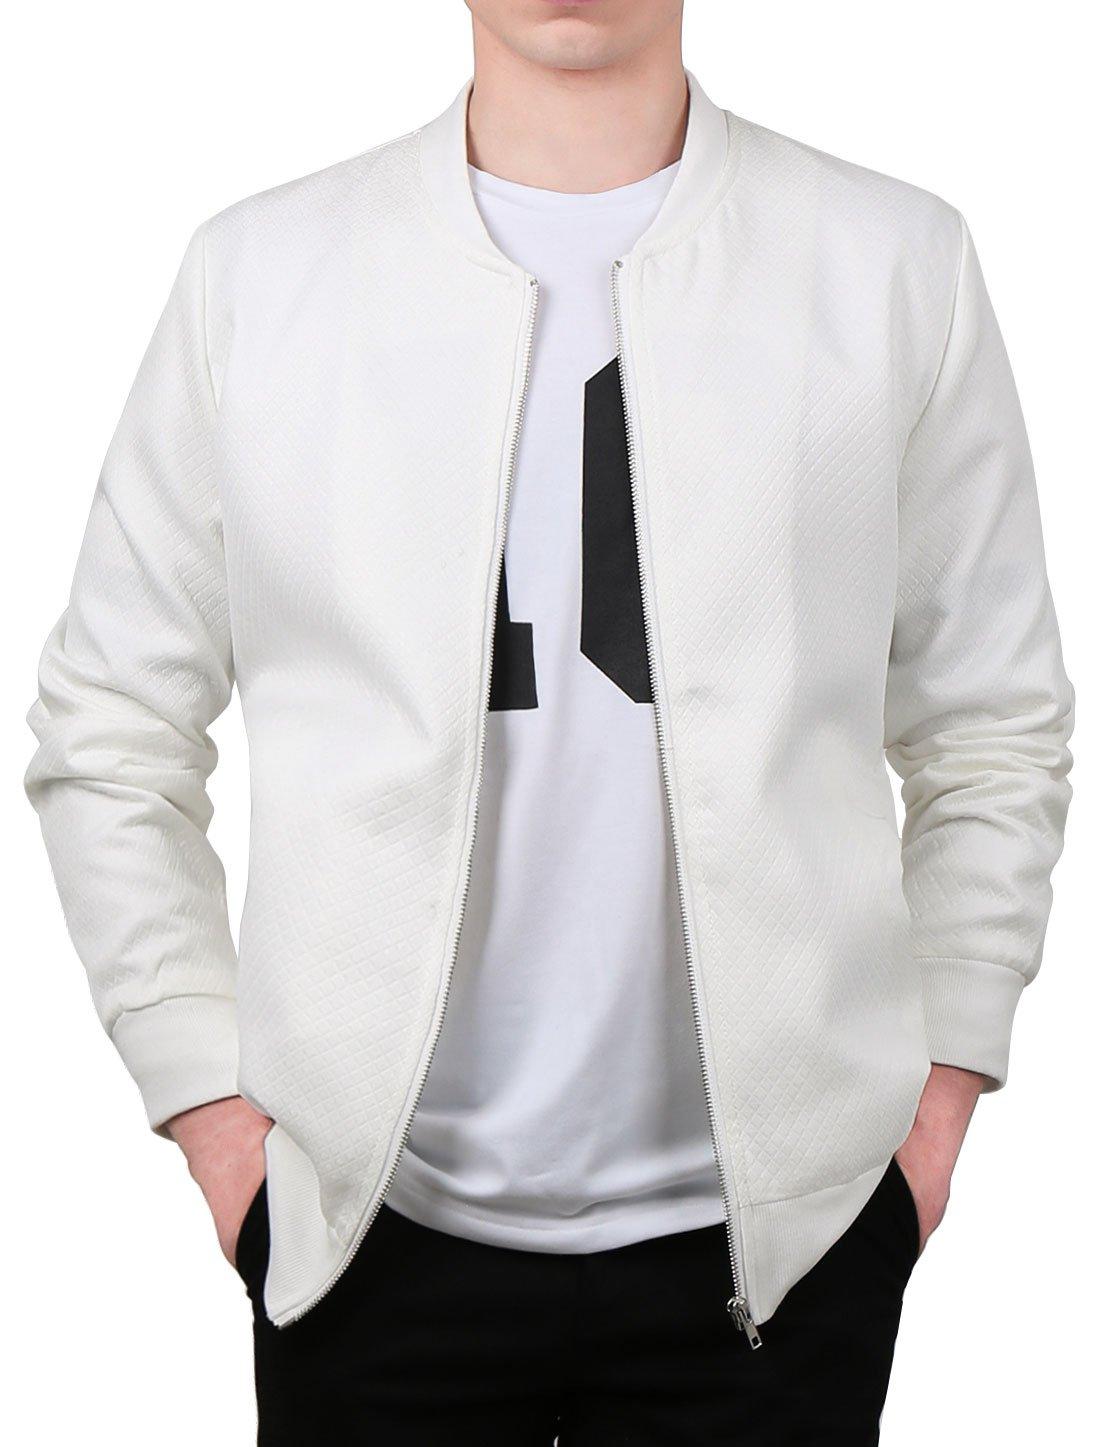 Allegra K Men Long Sleeve Stand Collar Zipper Slant Pockets Slim Fit Jacket S White by uxcell